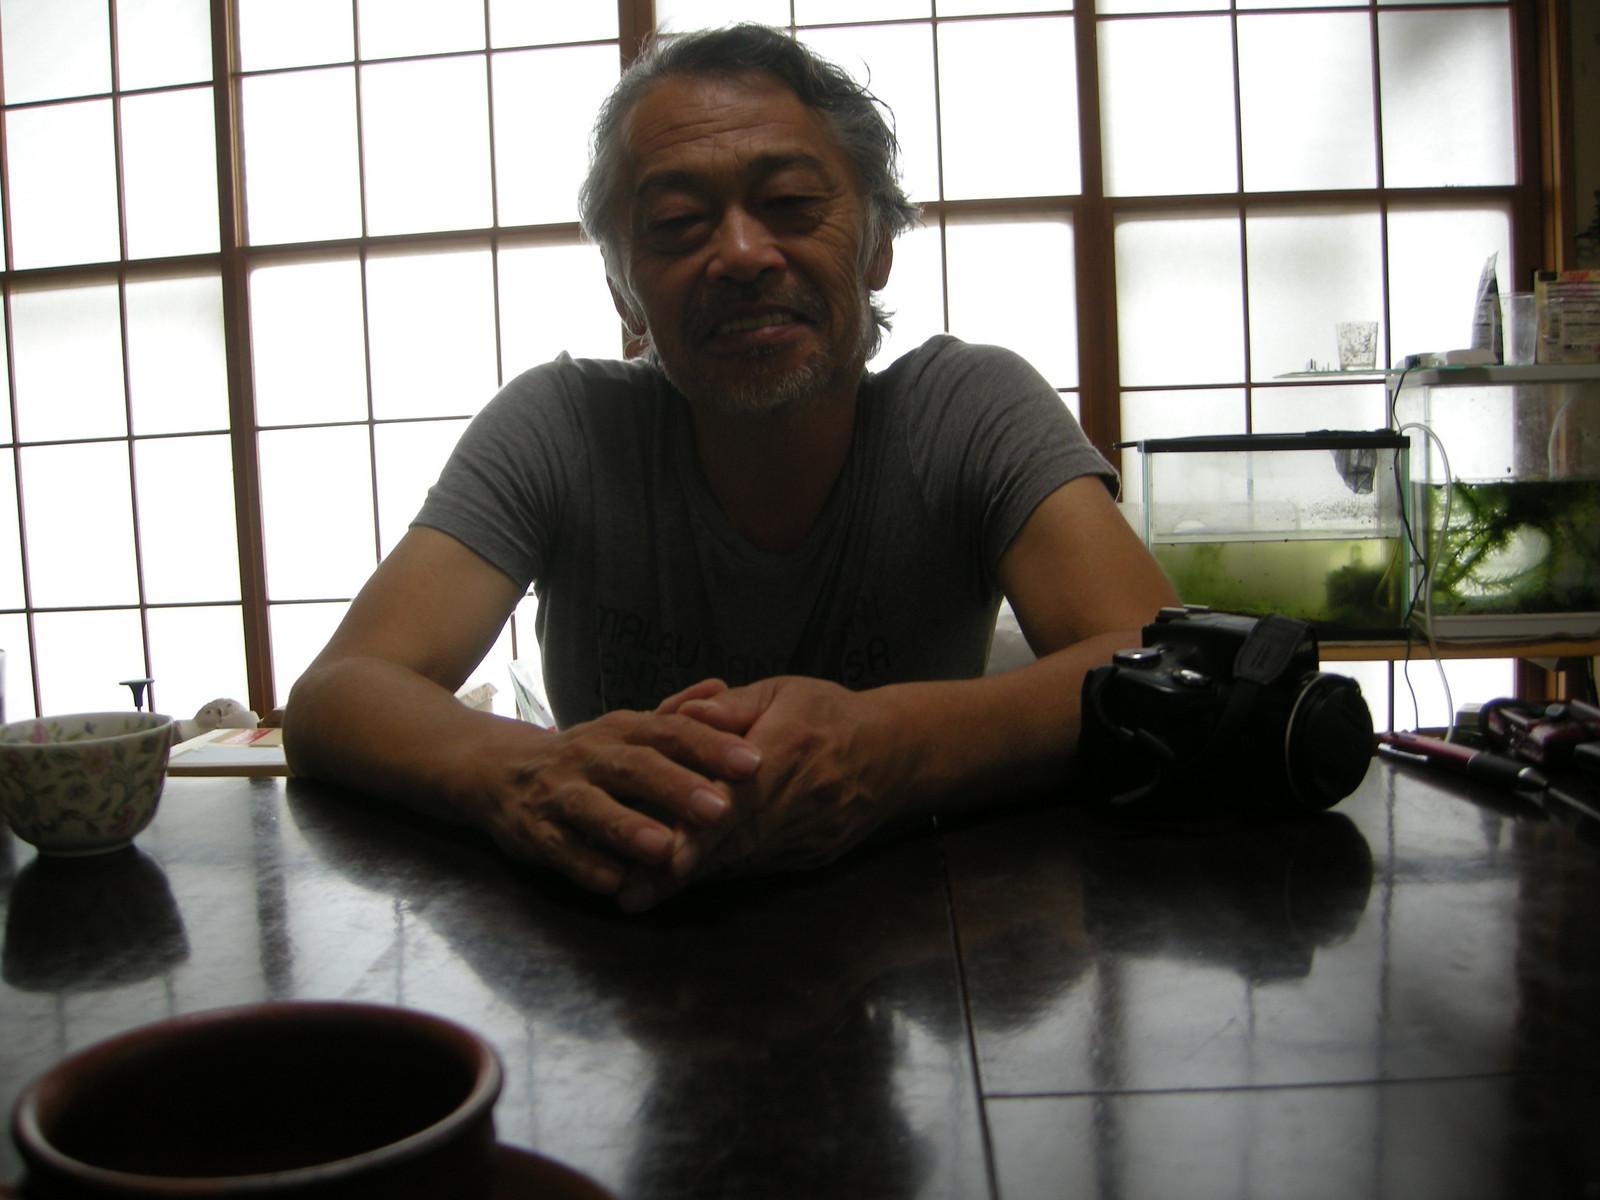 001nisimaki